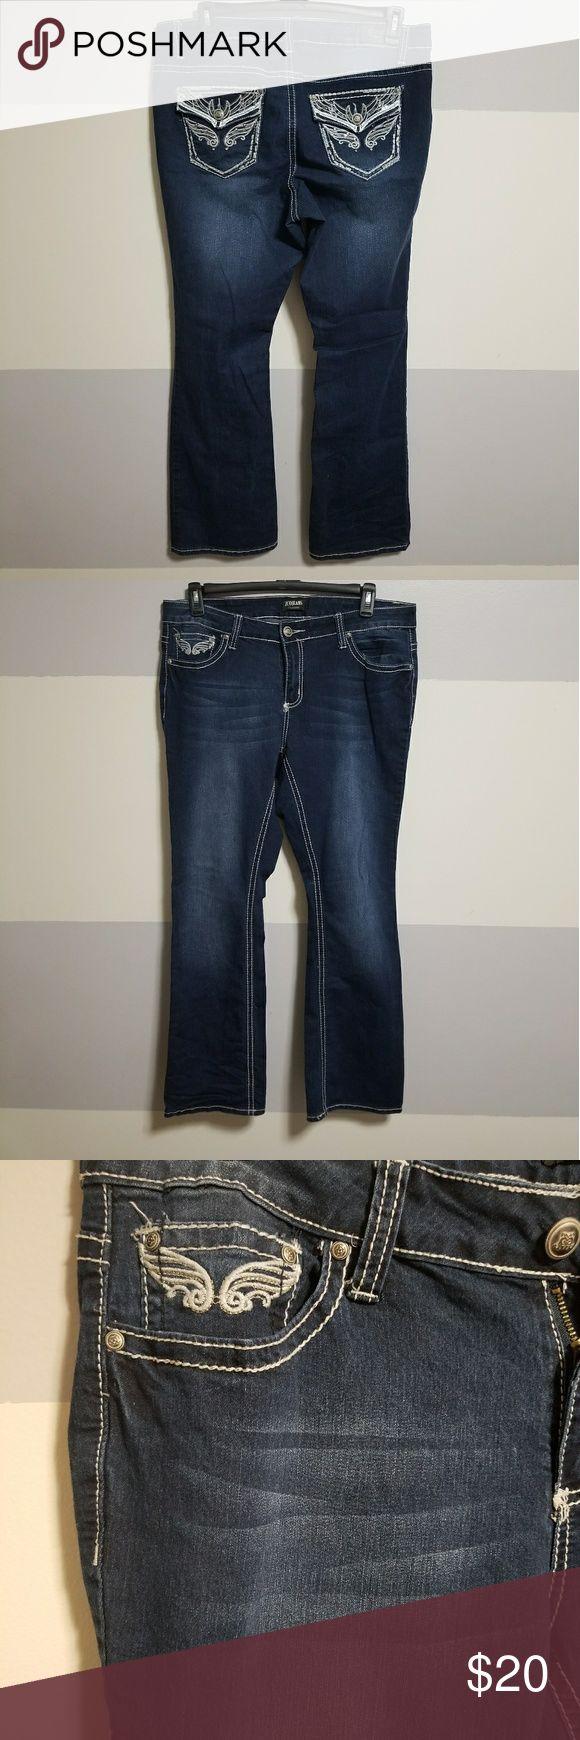 ZCO Jeans dark wash Dark wash ZCO Jeans, embellished back pockets. Only worn a few times! Comfortable slight stretch! ZCO Jeans